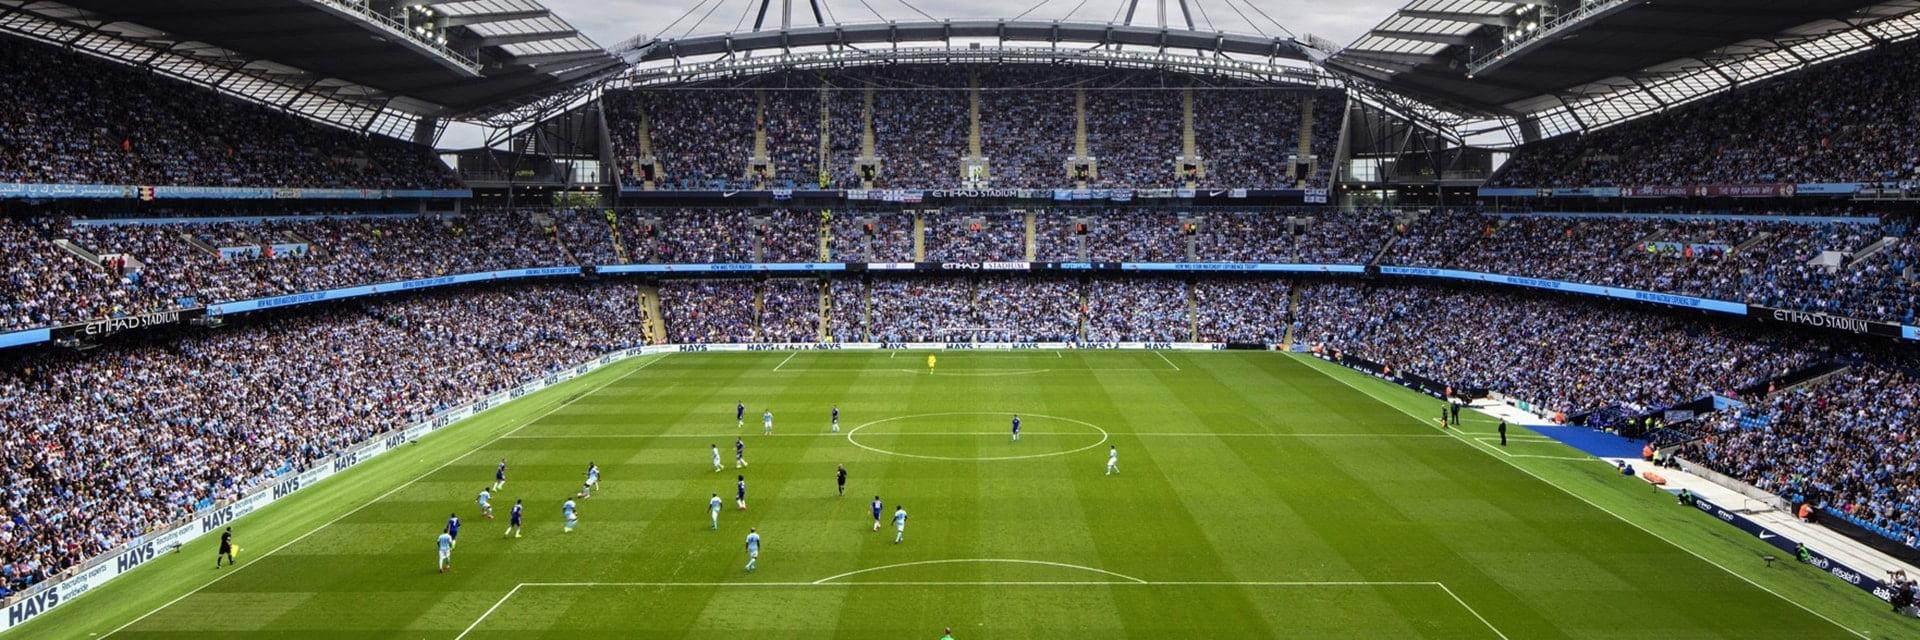 Manchester City - Norwich City, 0 meiom 15:00